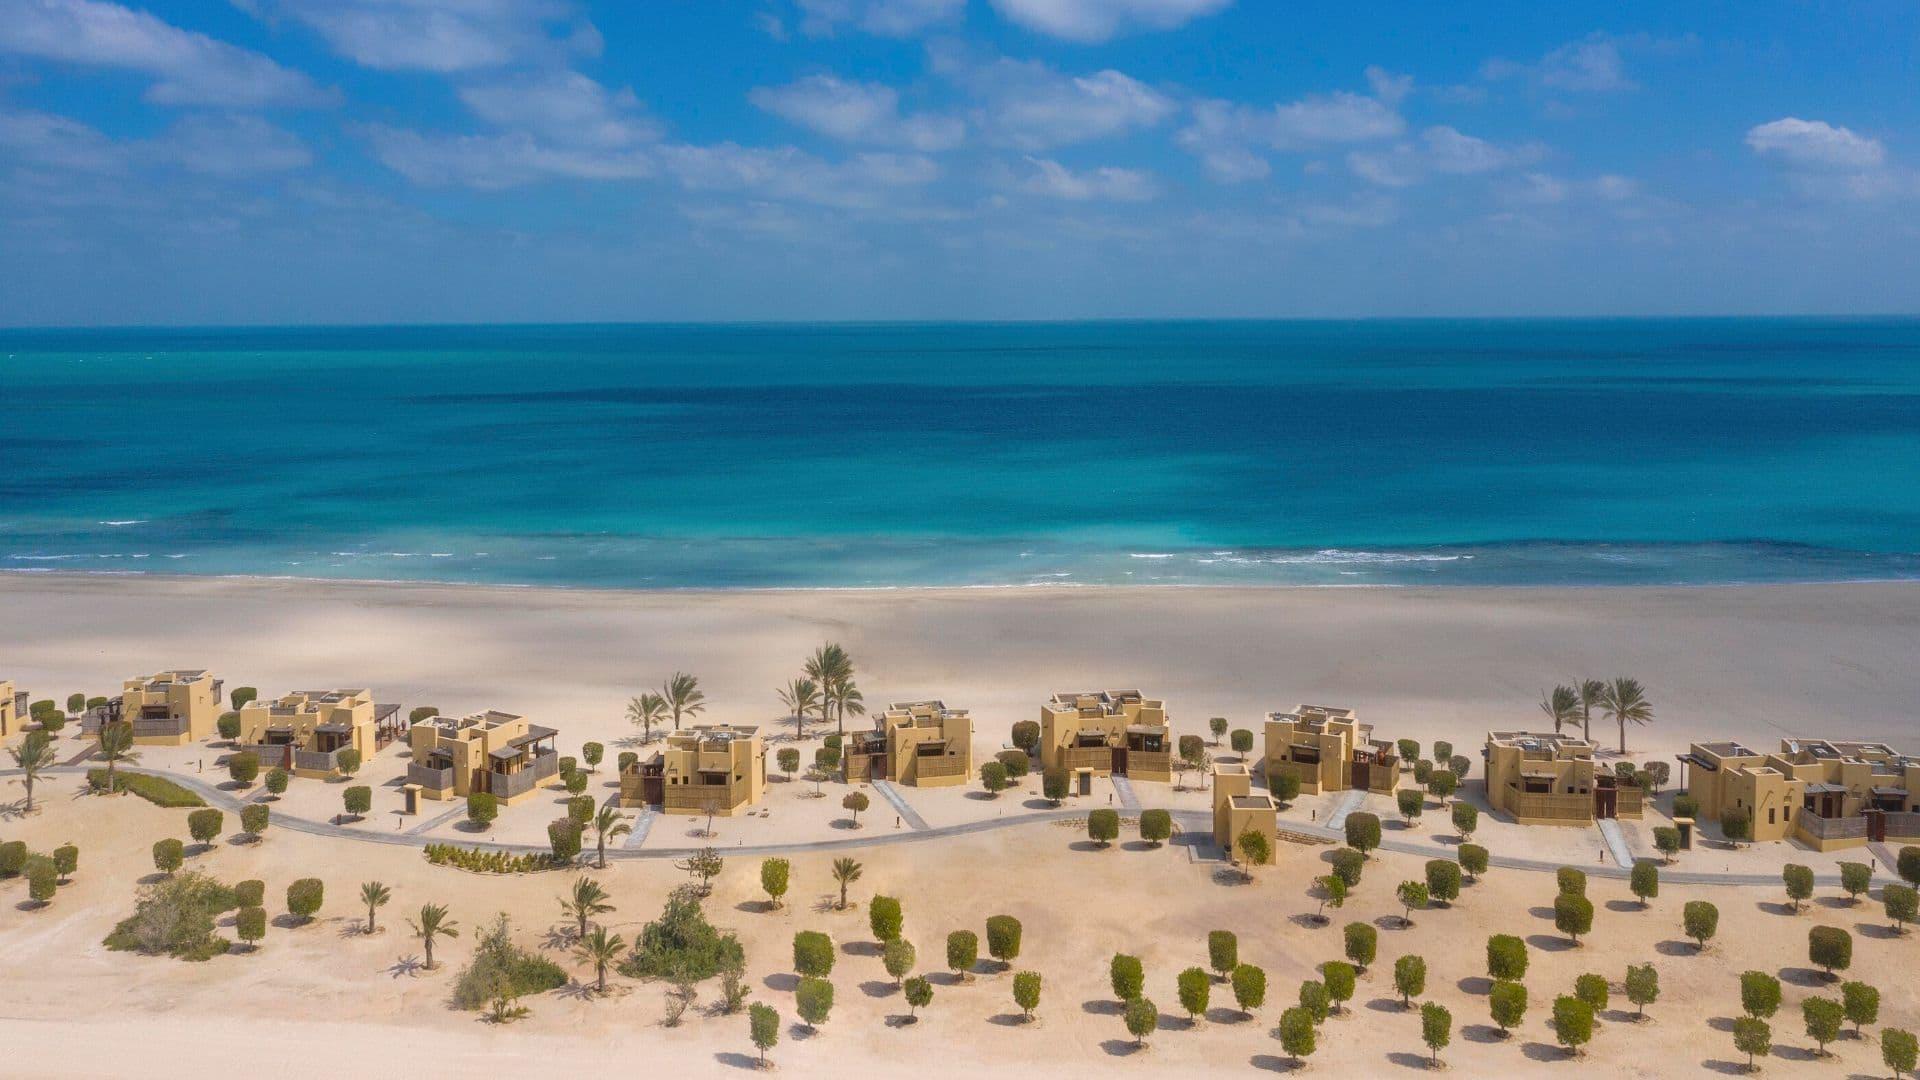 https://assets.anantara.com/image/upload/q_auto,f_auto/media/minor/anantara/images/anantara-sir-bani-yas-island-al-yamm-villa-resort/the-resort/desktop-banner/anantara_al_yamm_villa_resort_desktop_banner_2020_1920x1080.jpg